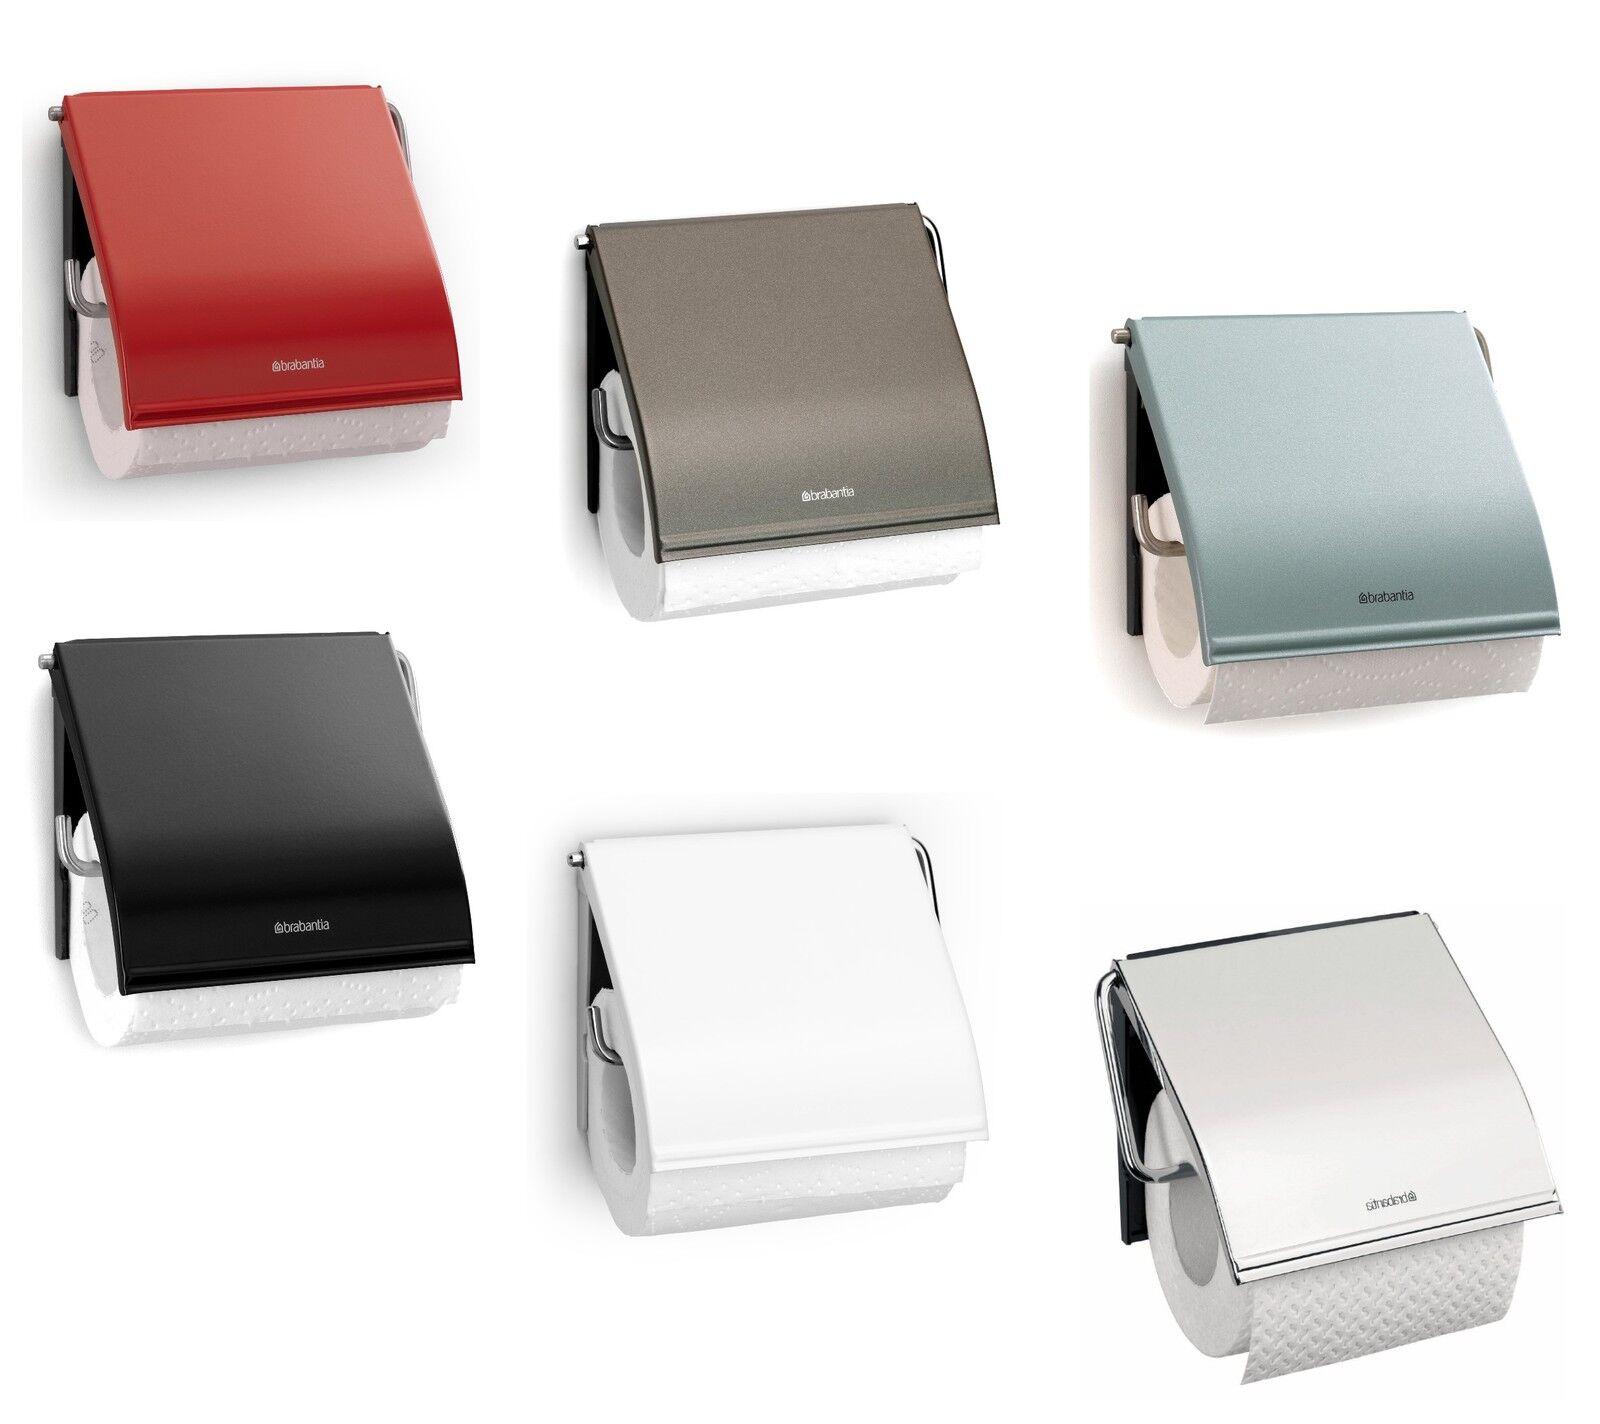 Brabantia Toilettenpapierhalter Klopapierhalter Halter Metall Klappe Platinum